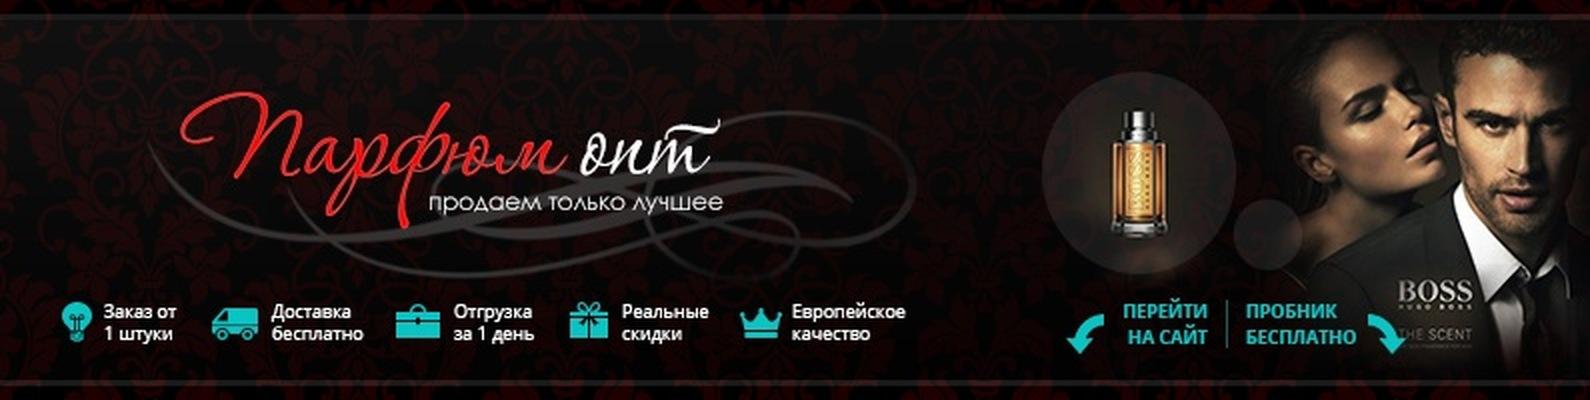 парфюмерия склад новосибирск